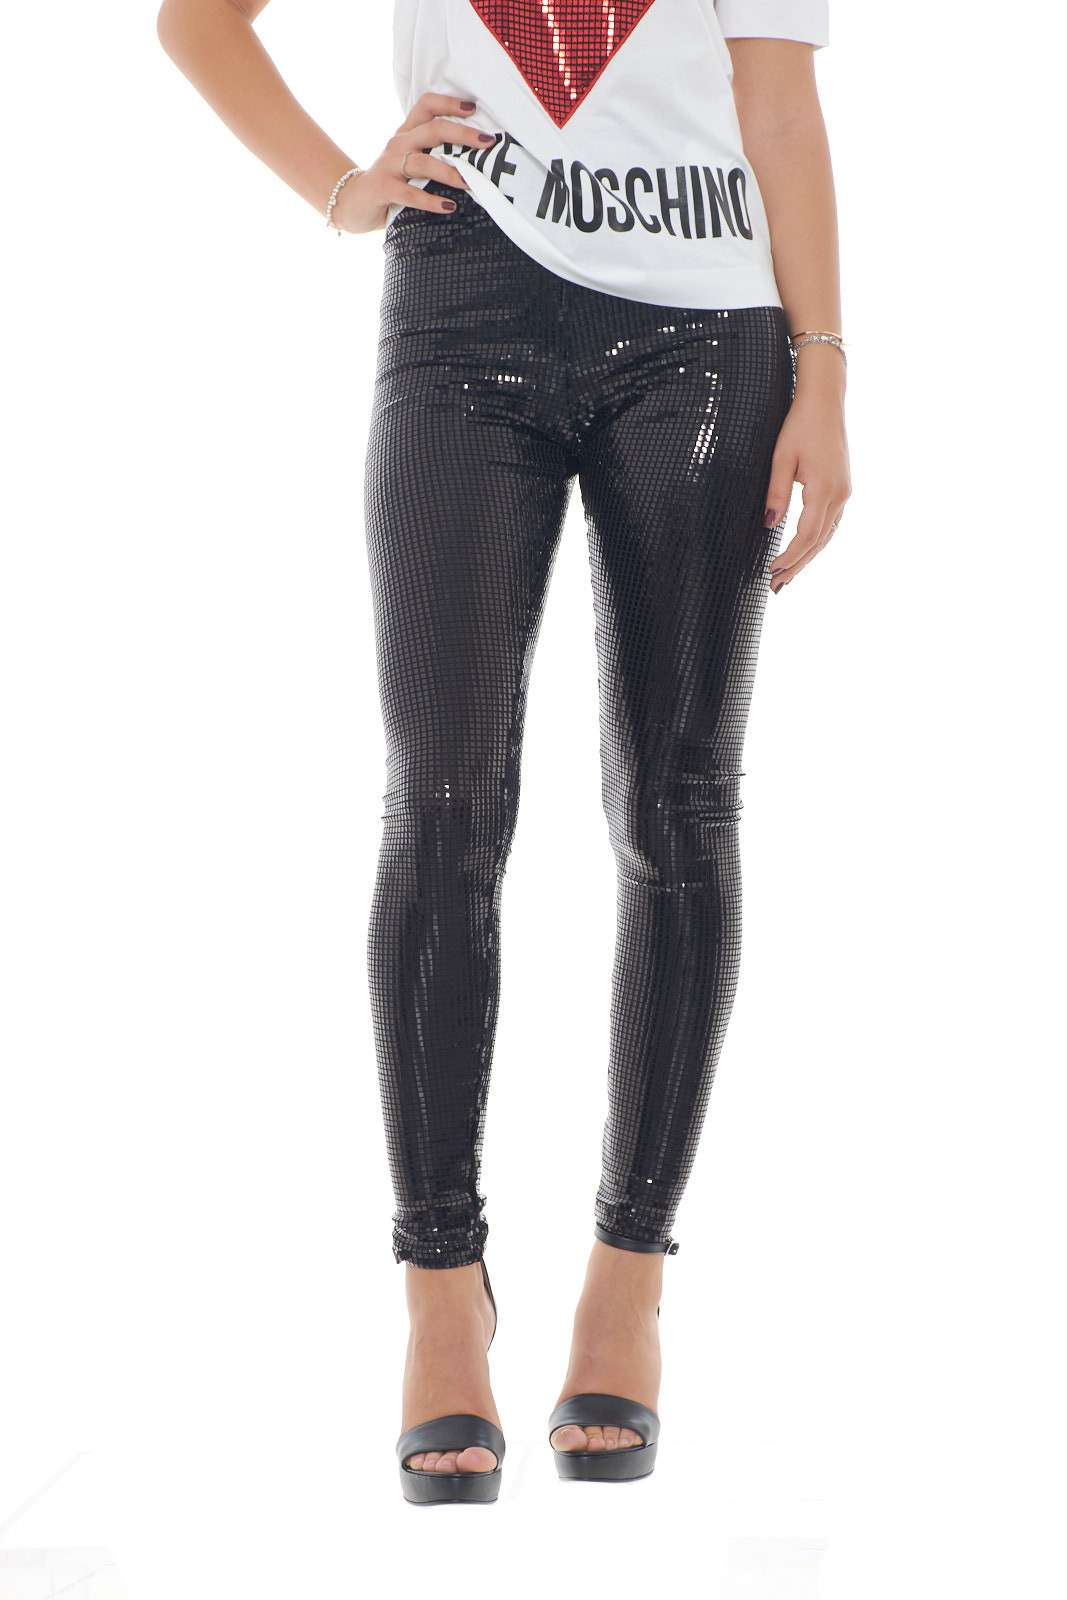 https://www.parmax.com/media/catalog/product/a/i/AI-outlet_parmax-pantaloni-donna-Moschino-W%201%20516%2082%20E%202196-A.jpg